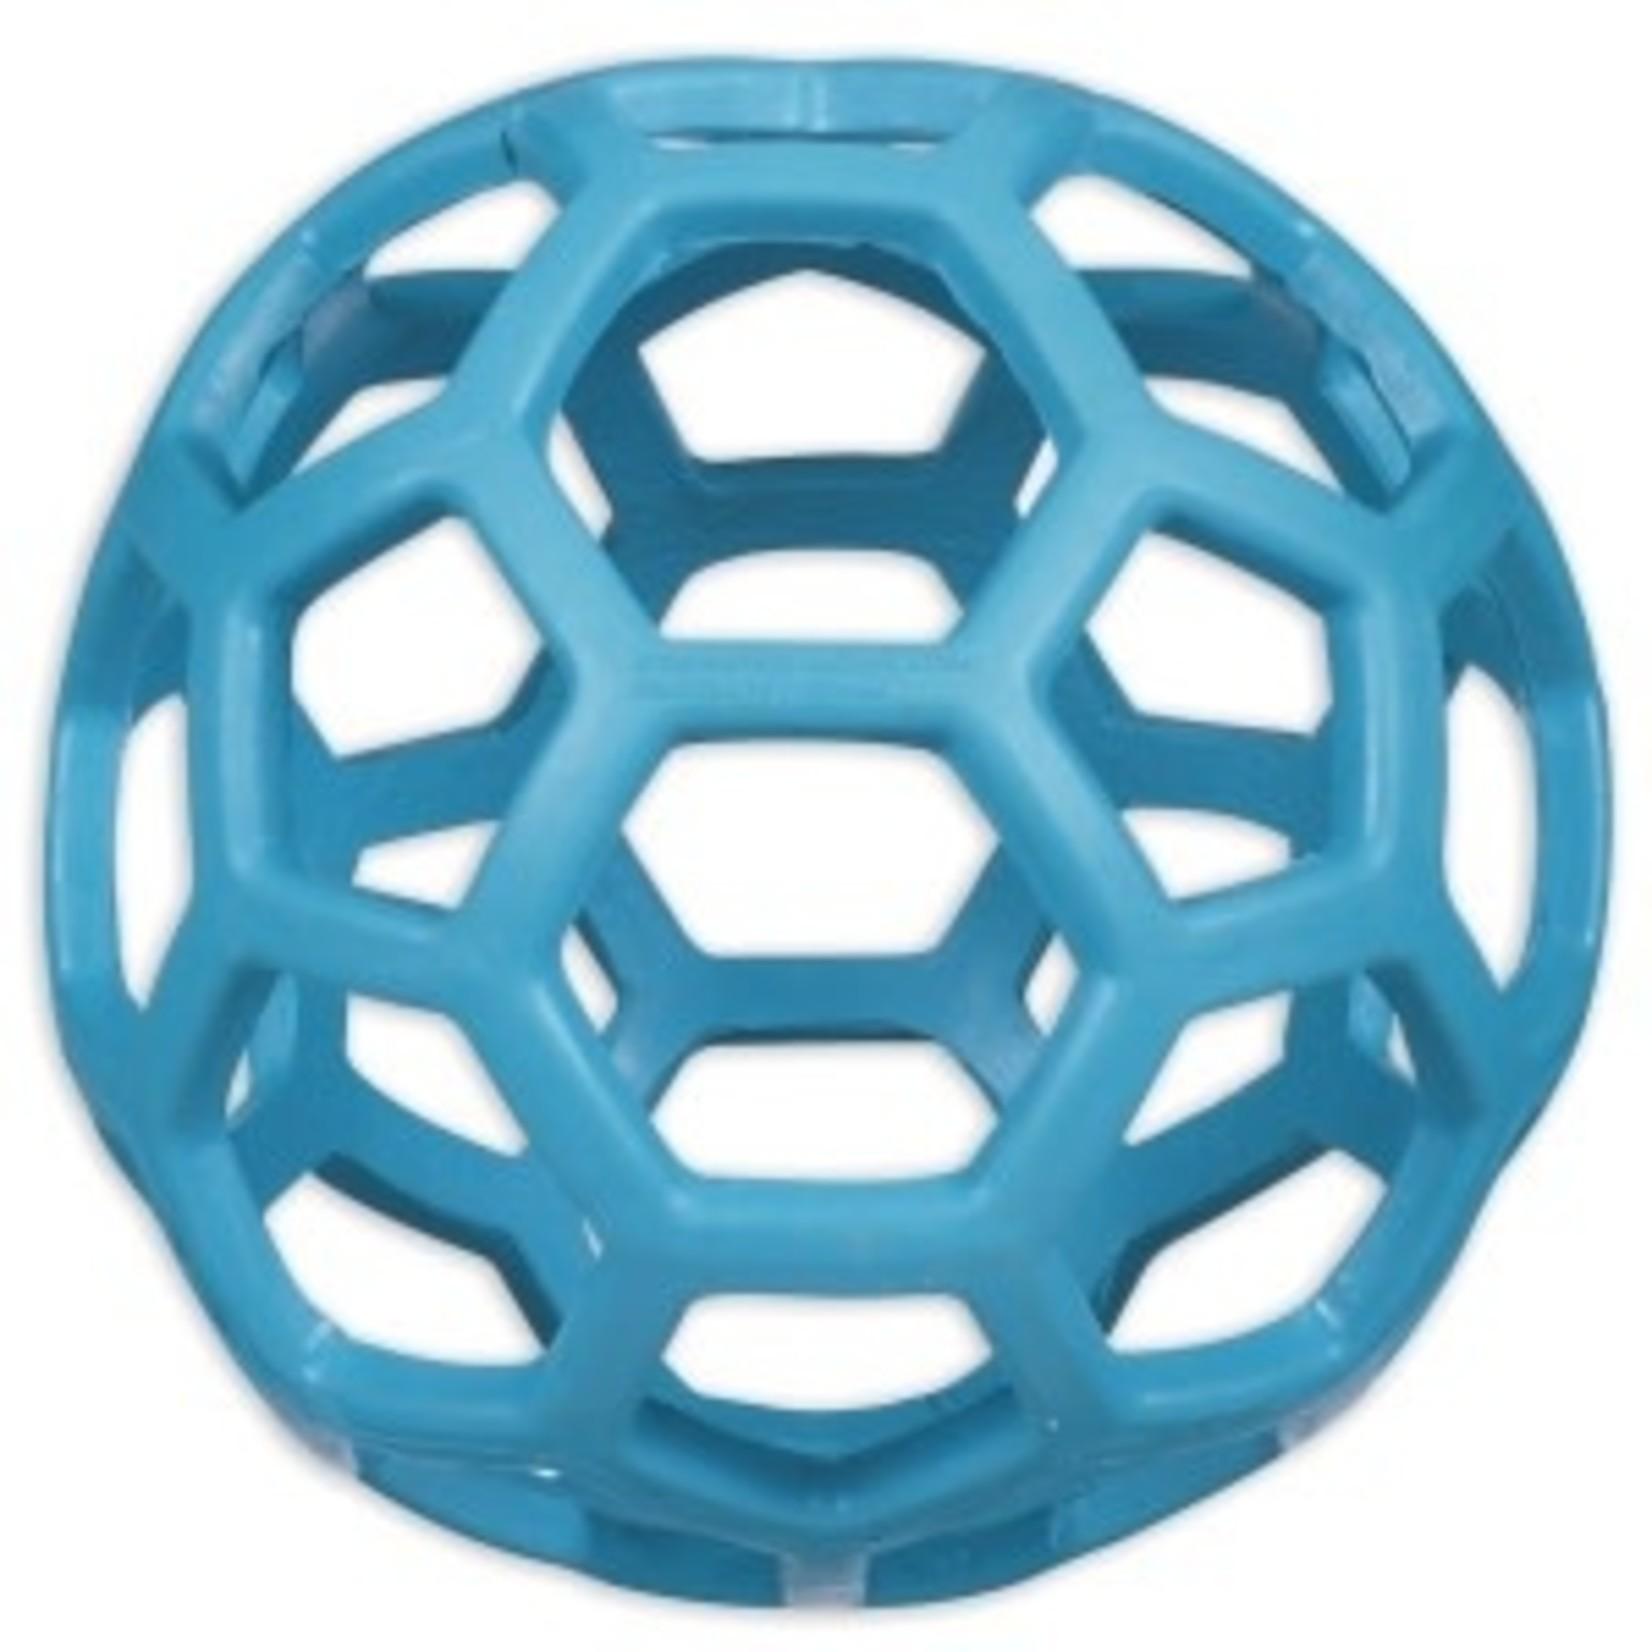 Petmate JWP Hol-Ee Roller Dog Toy